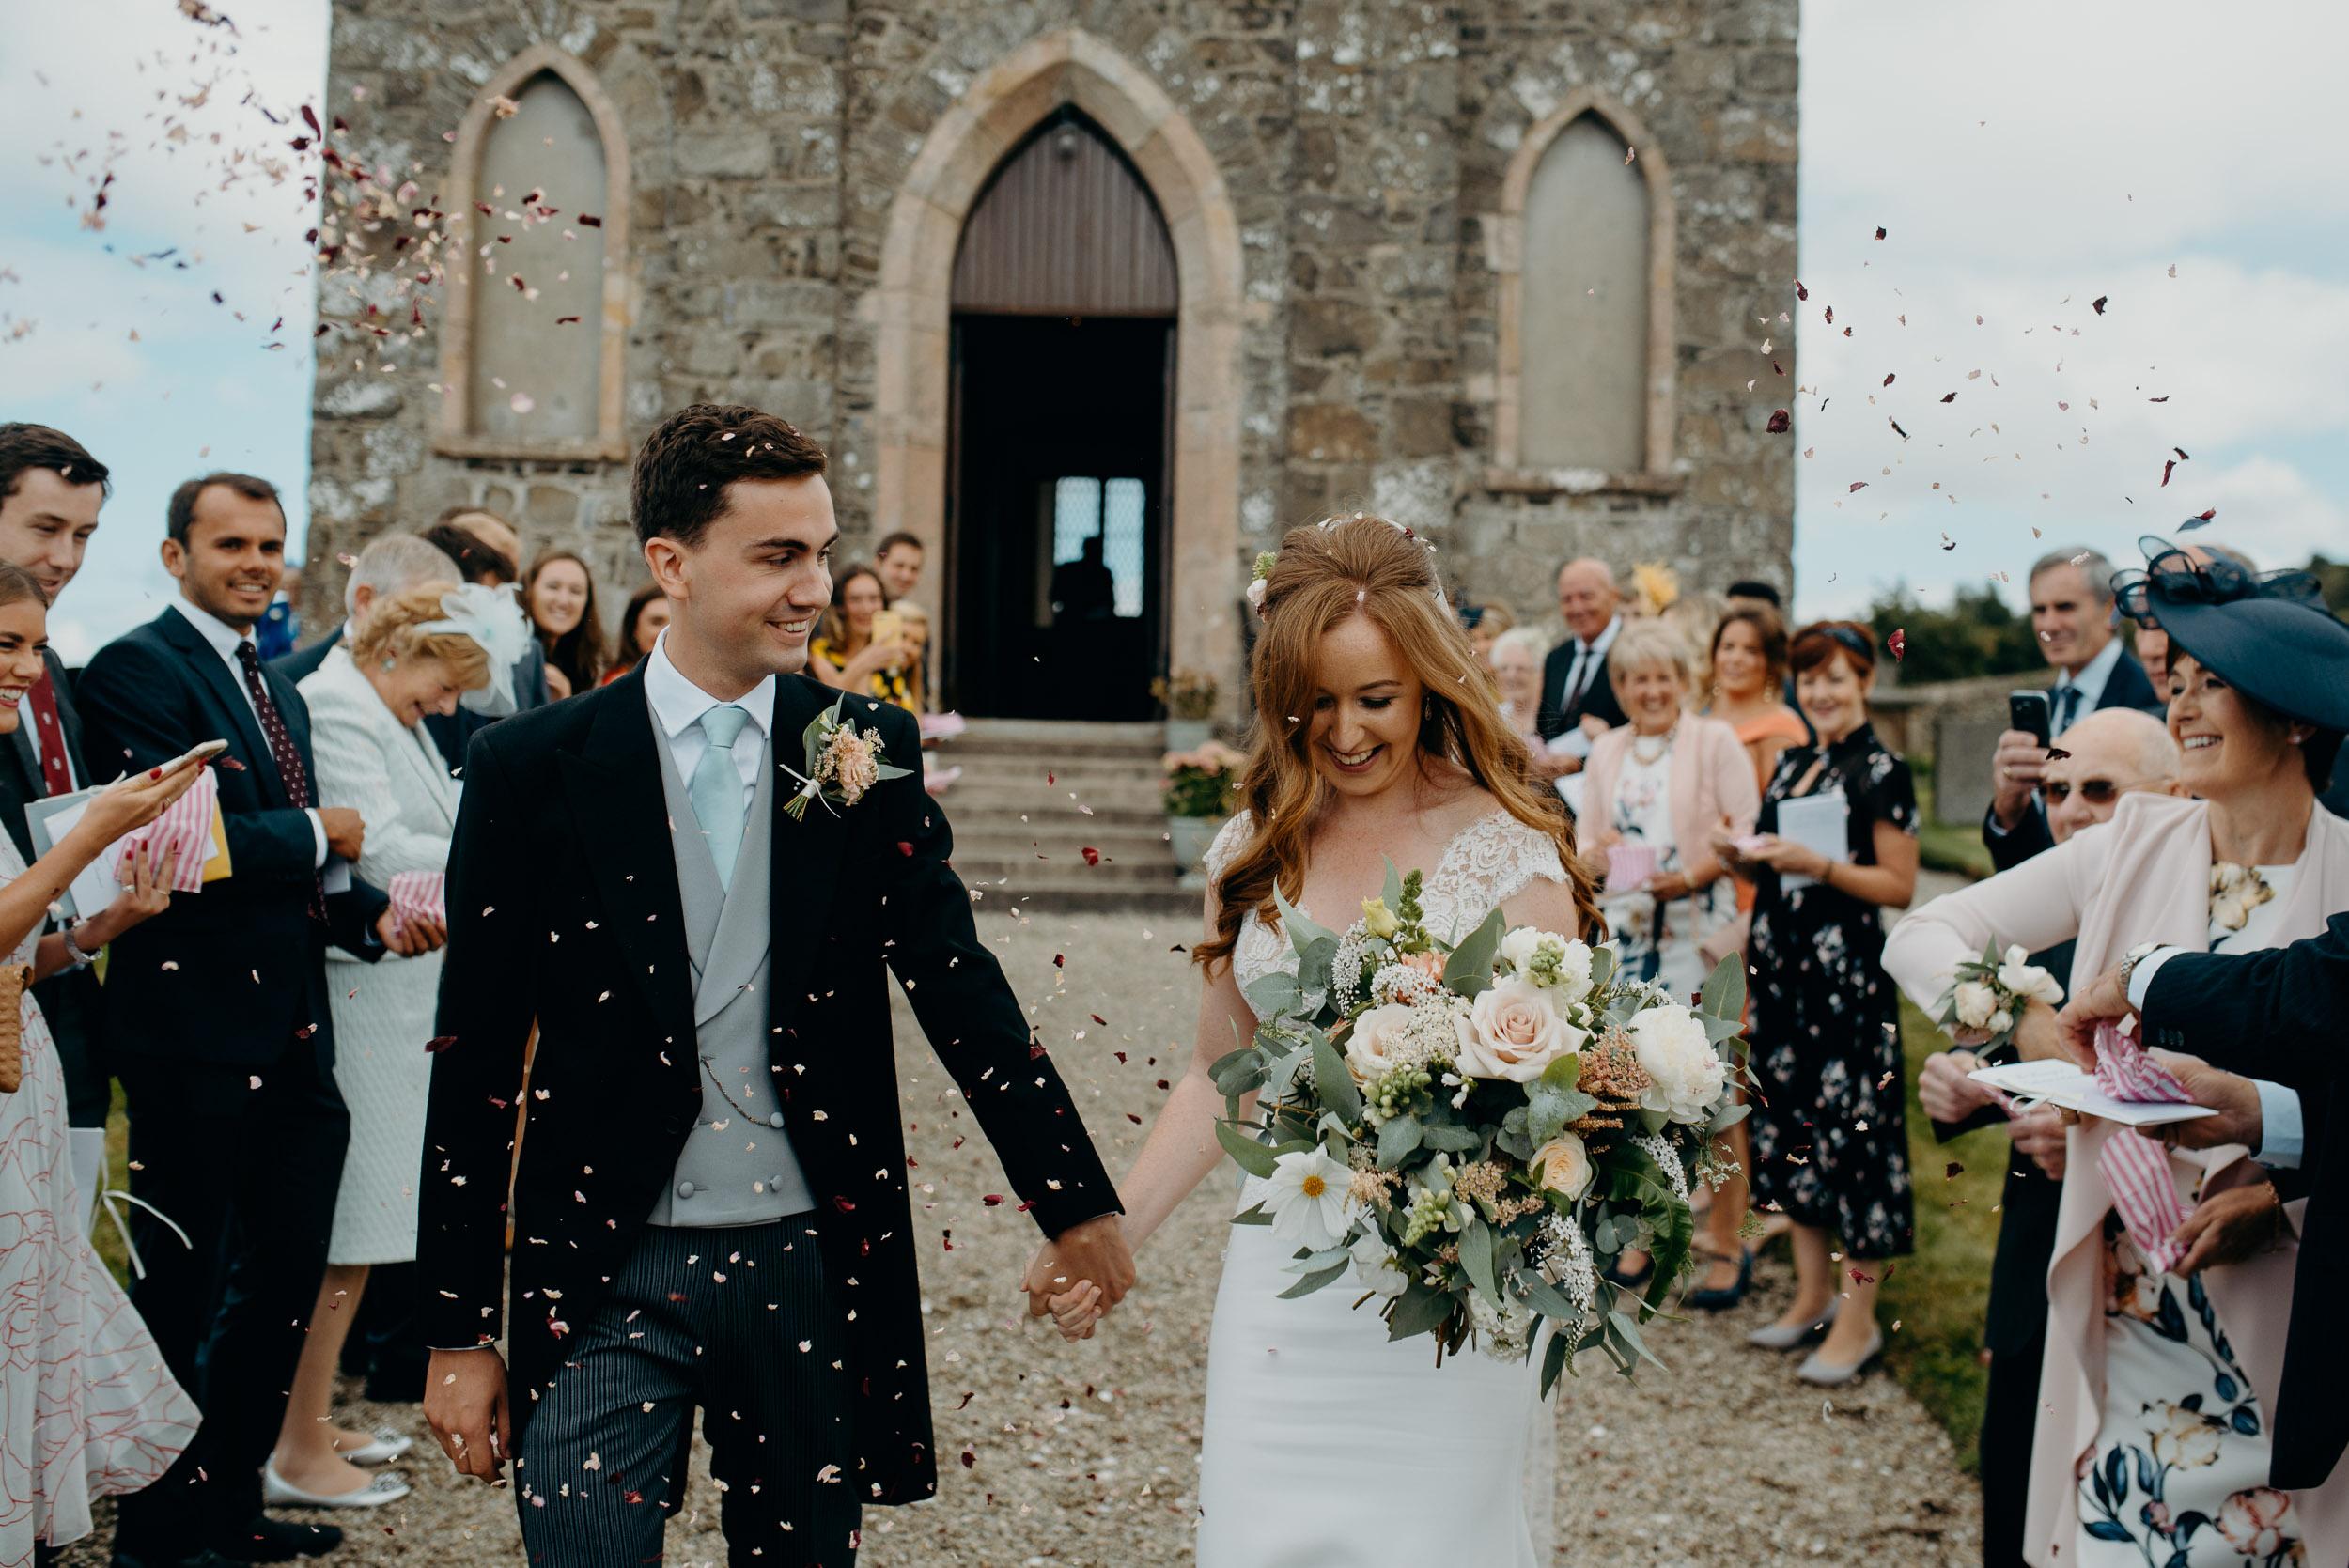 drenagh estate wedding photography-59.jpg